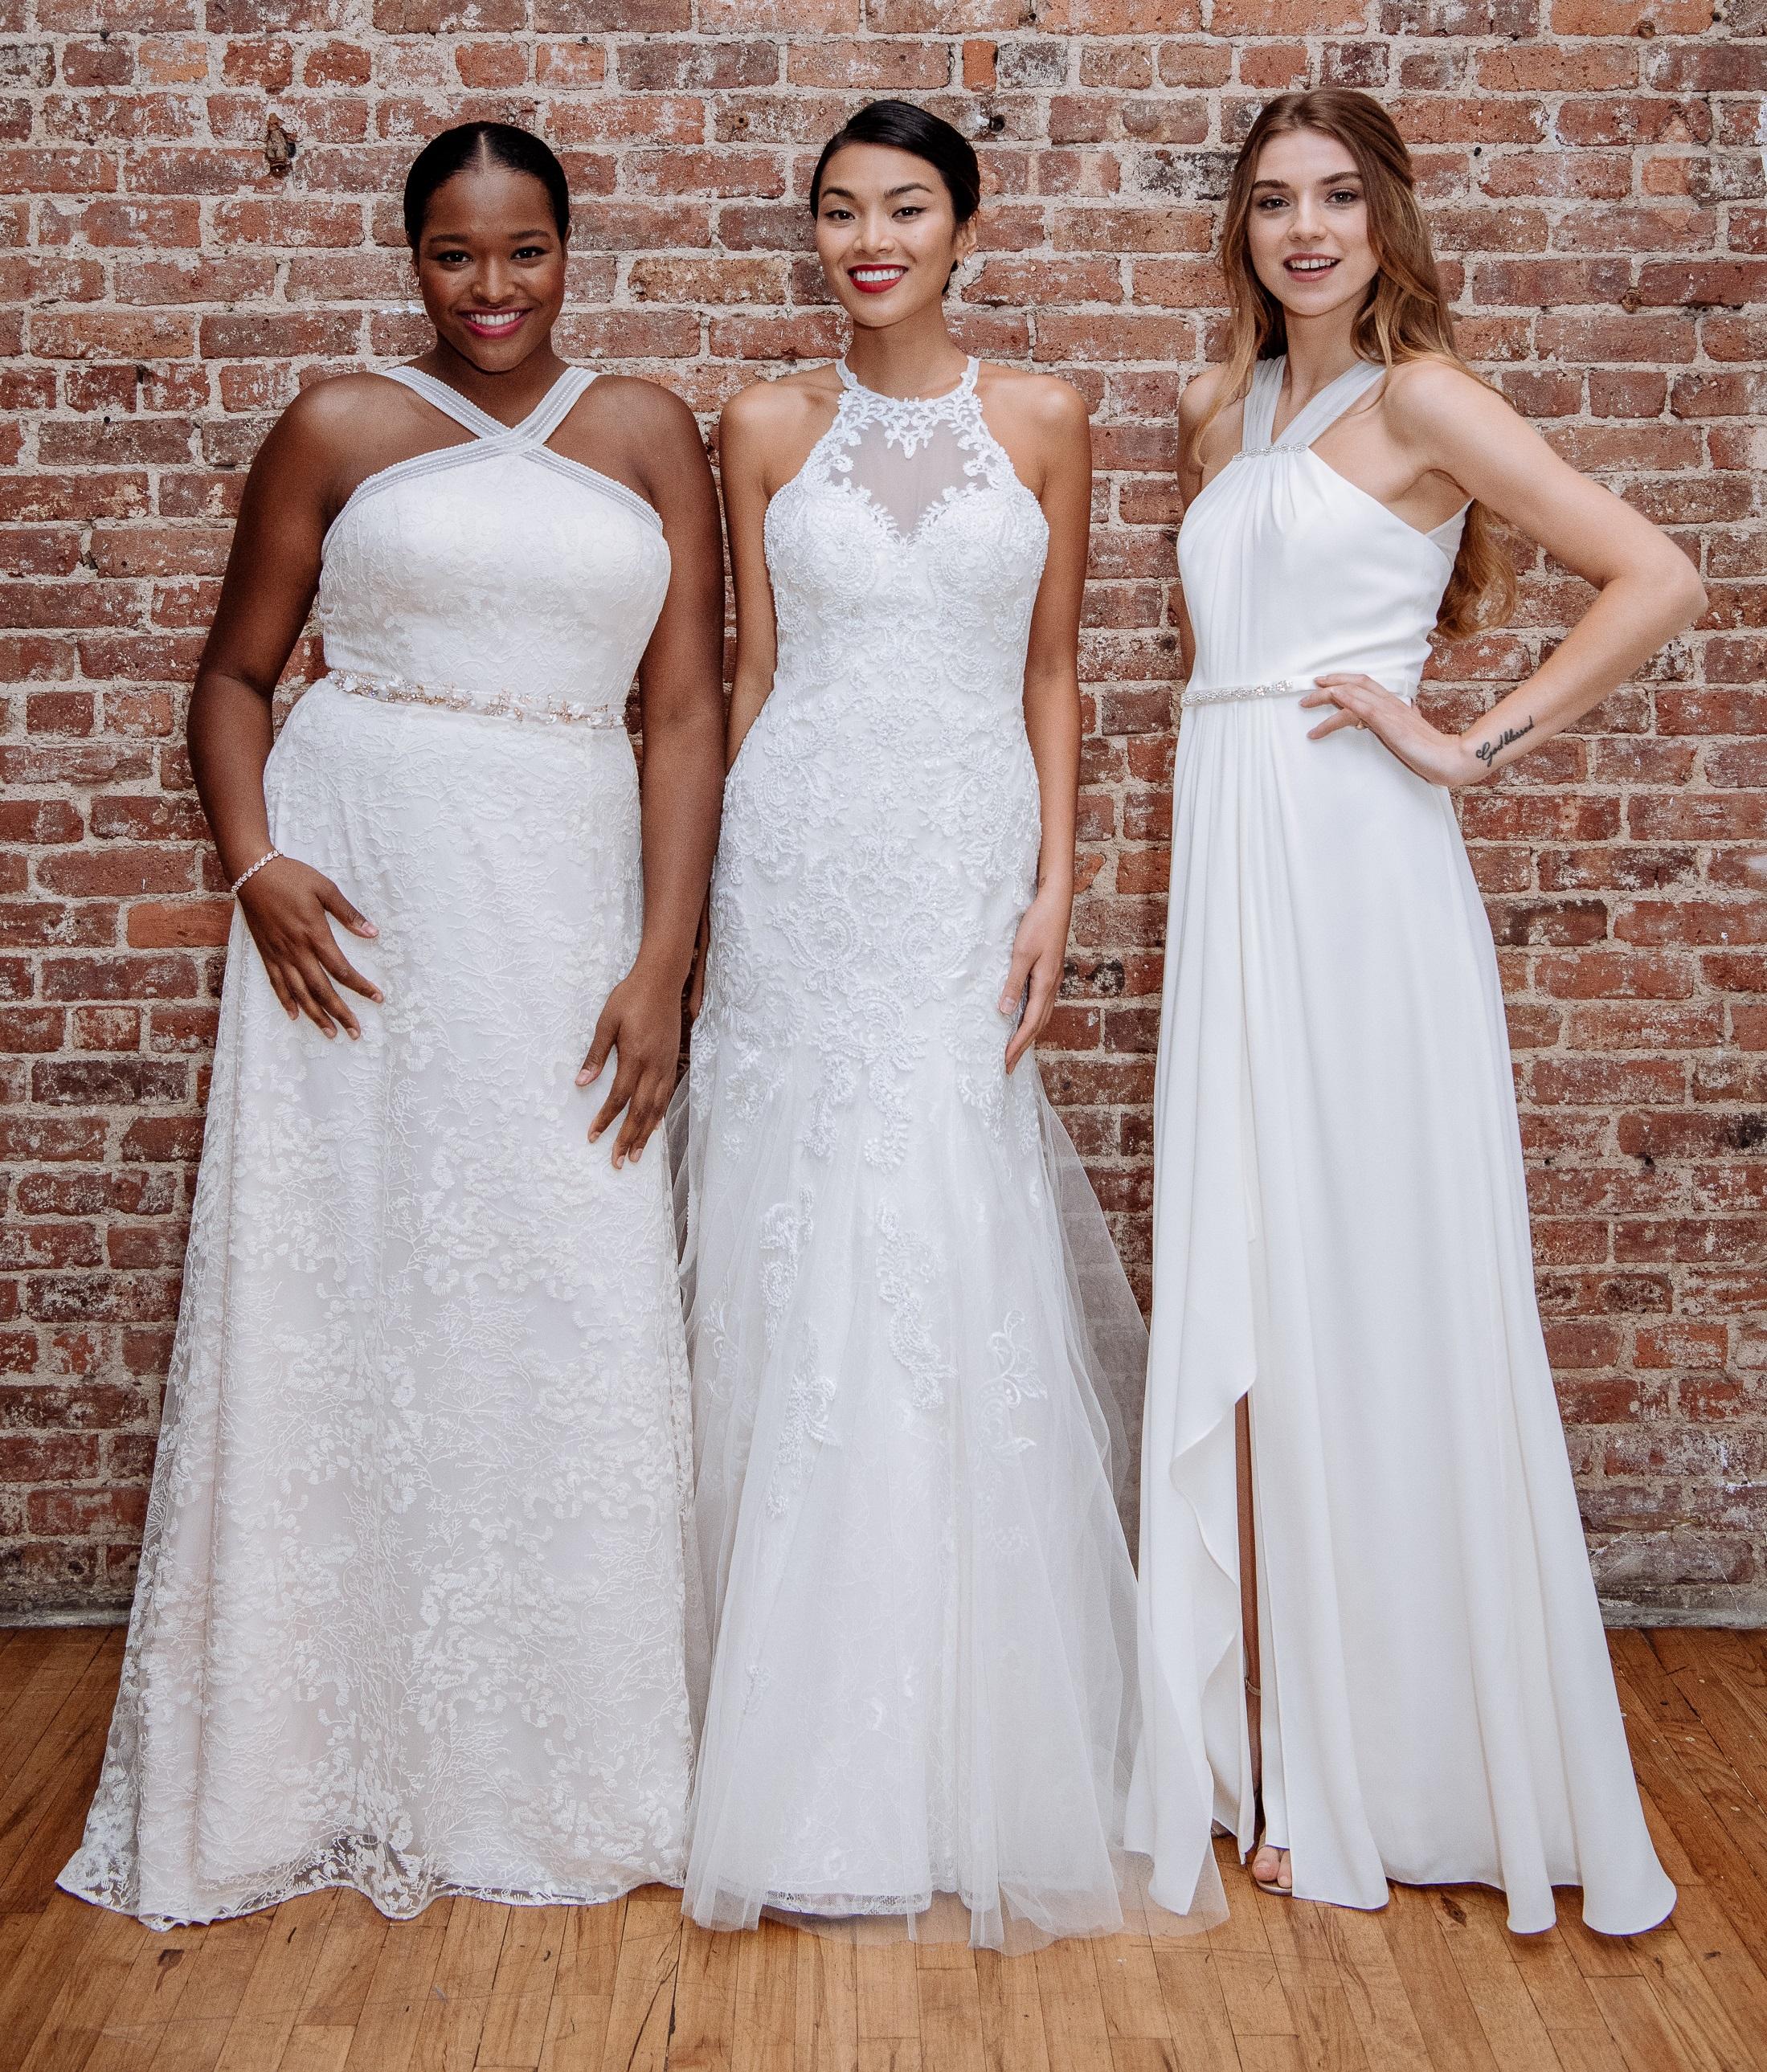 2019 Spring Wedding Dresses | High Neckline Wedding Dresses